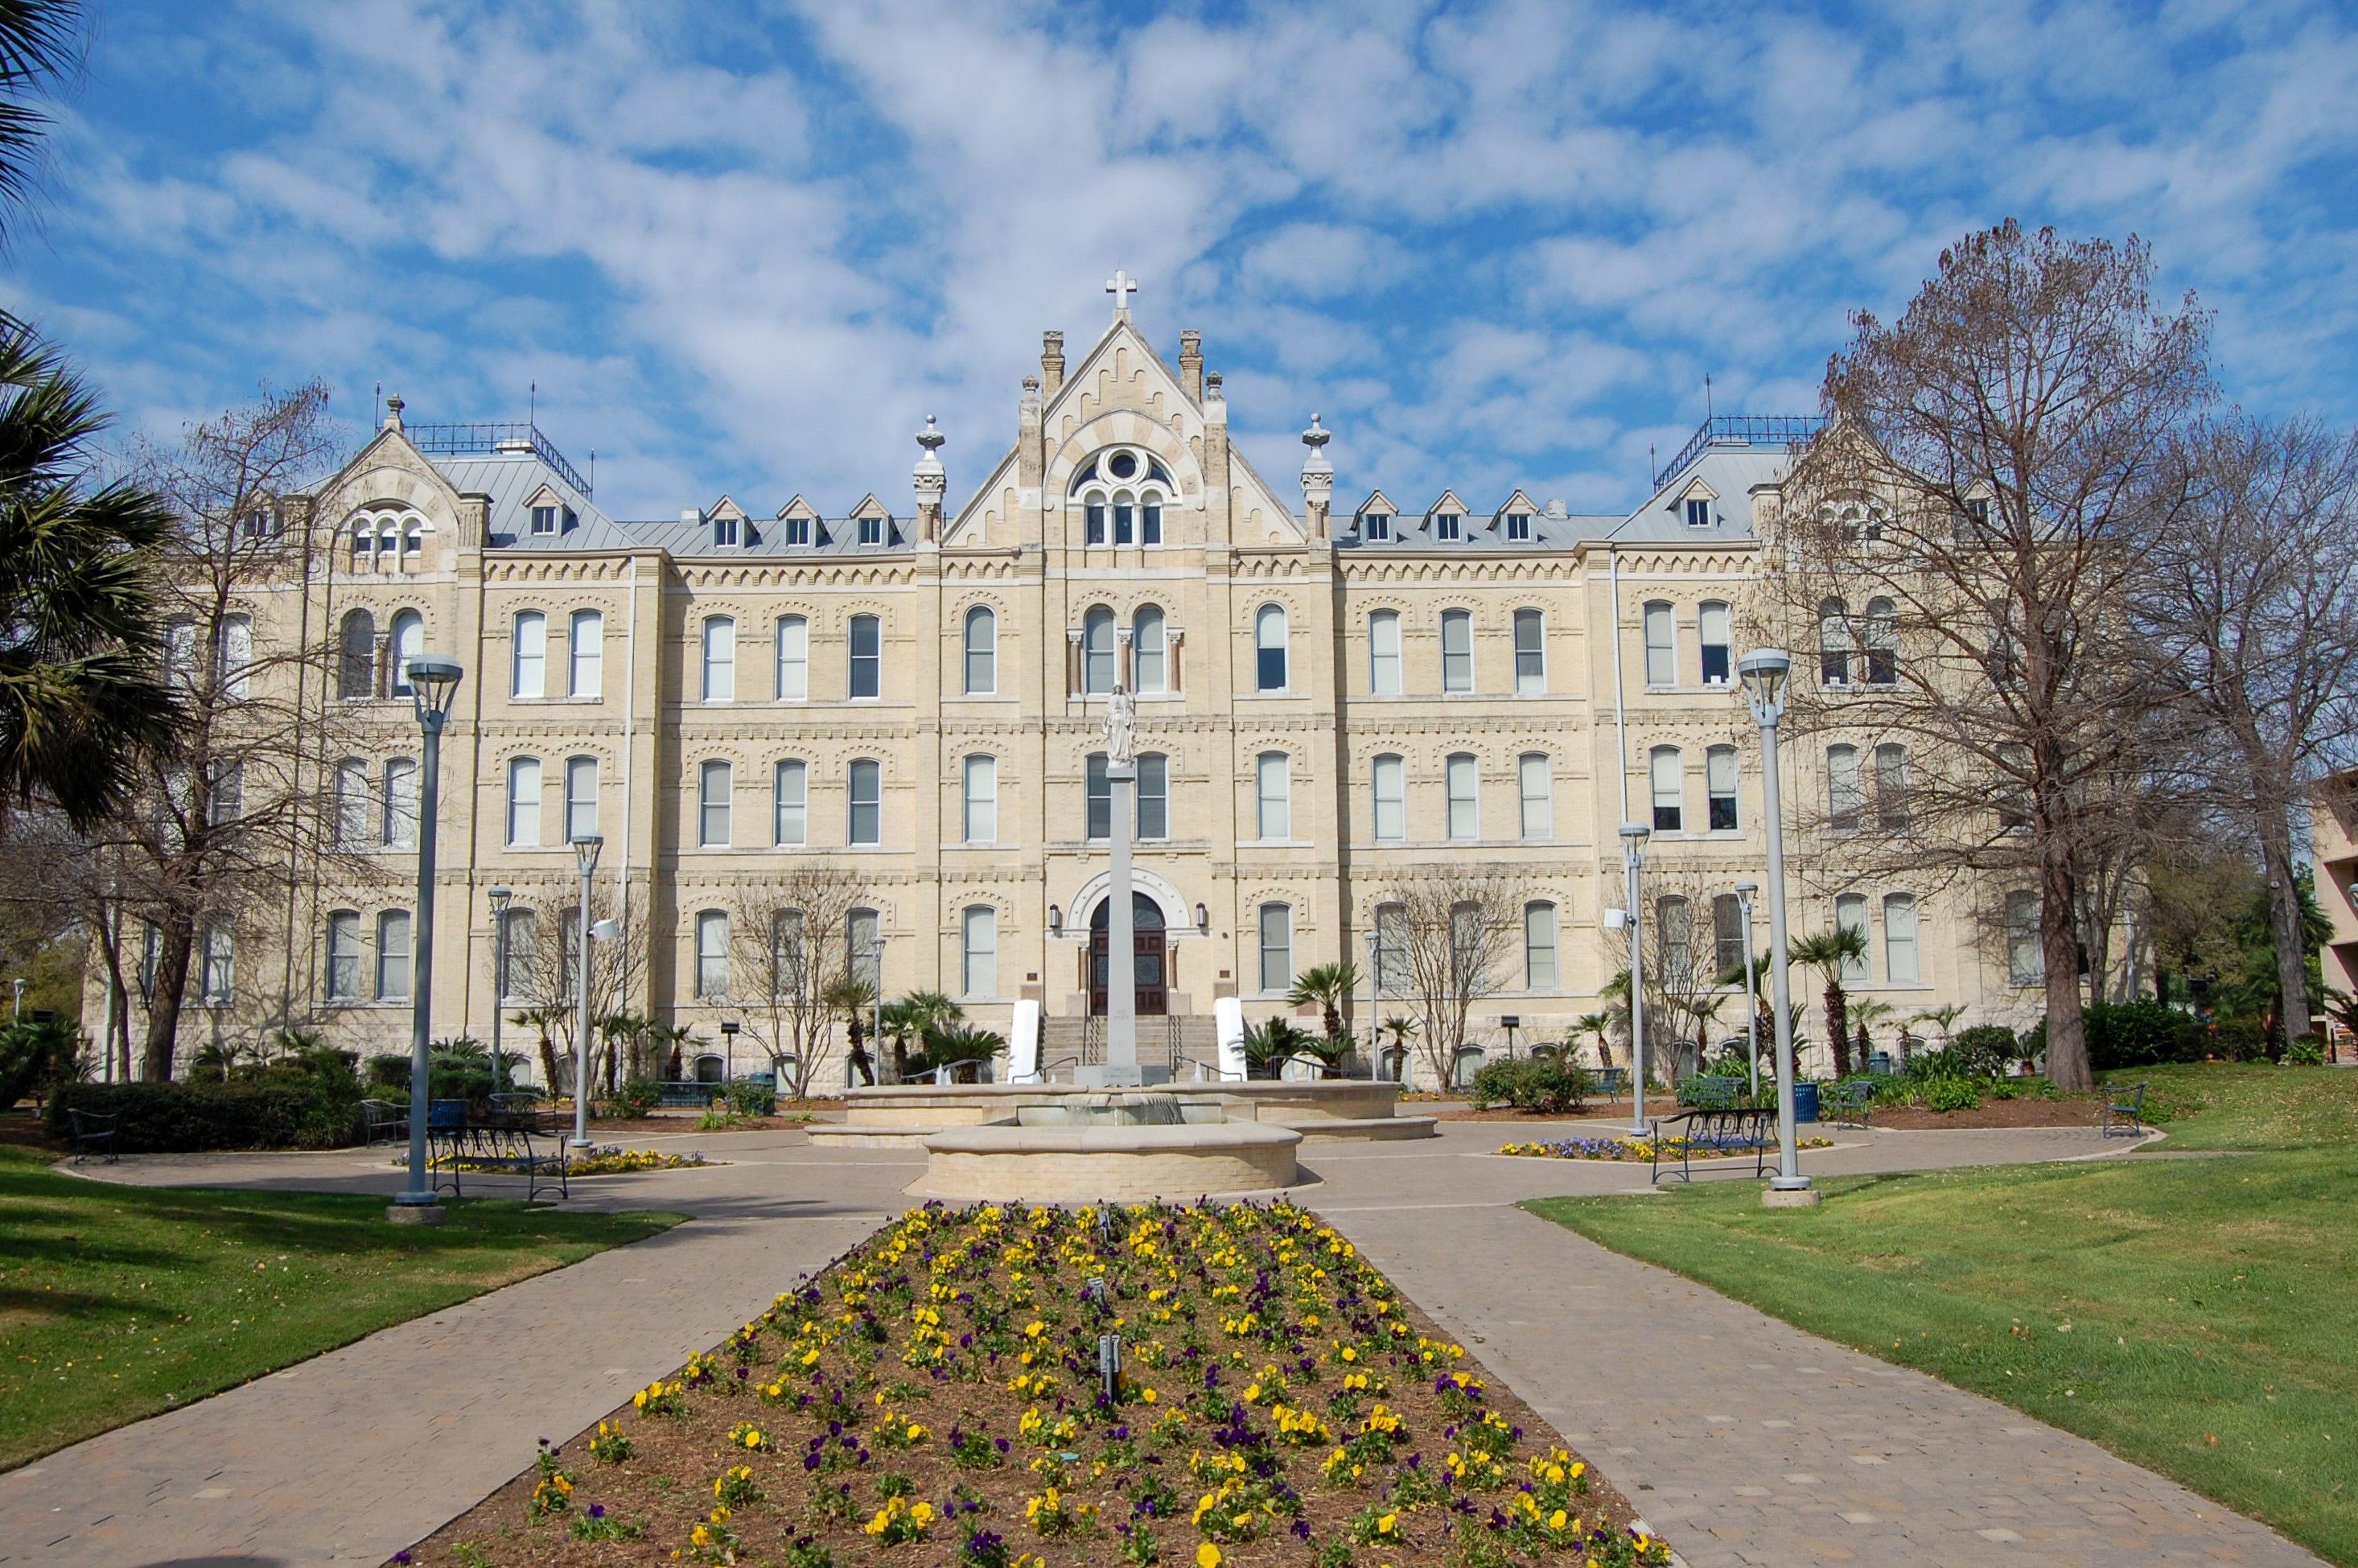 St. Mary's University – St. Louis Hall Renovation